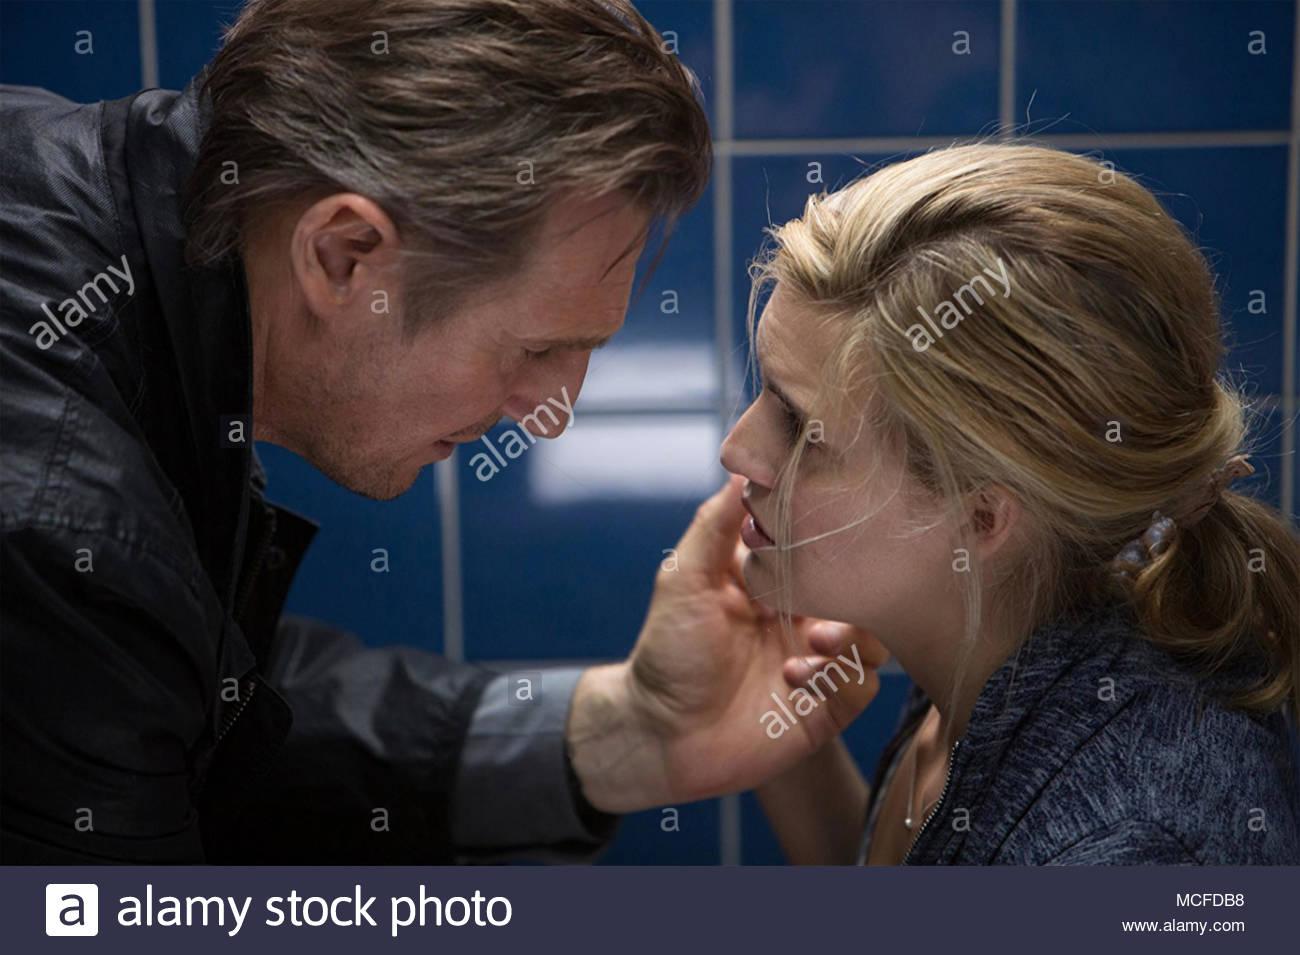 Prises 3 - 2014 film EuropaCorp avec Liam Neeson et Maggie Grace Photo Stock